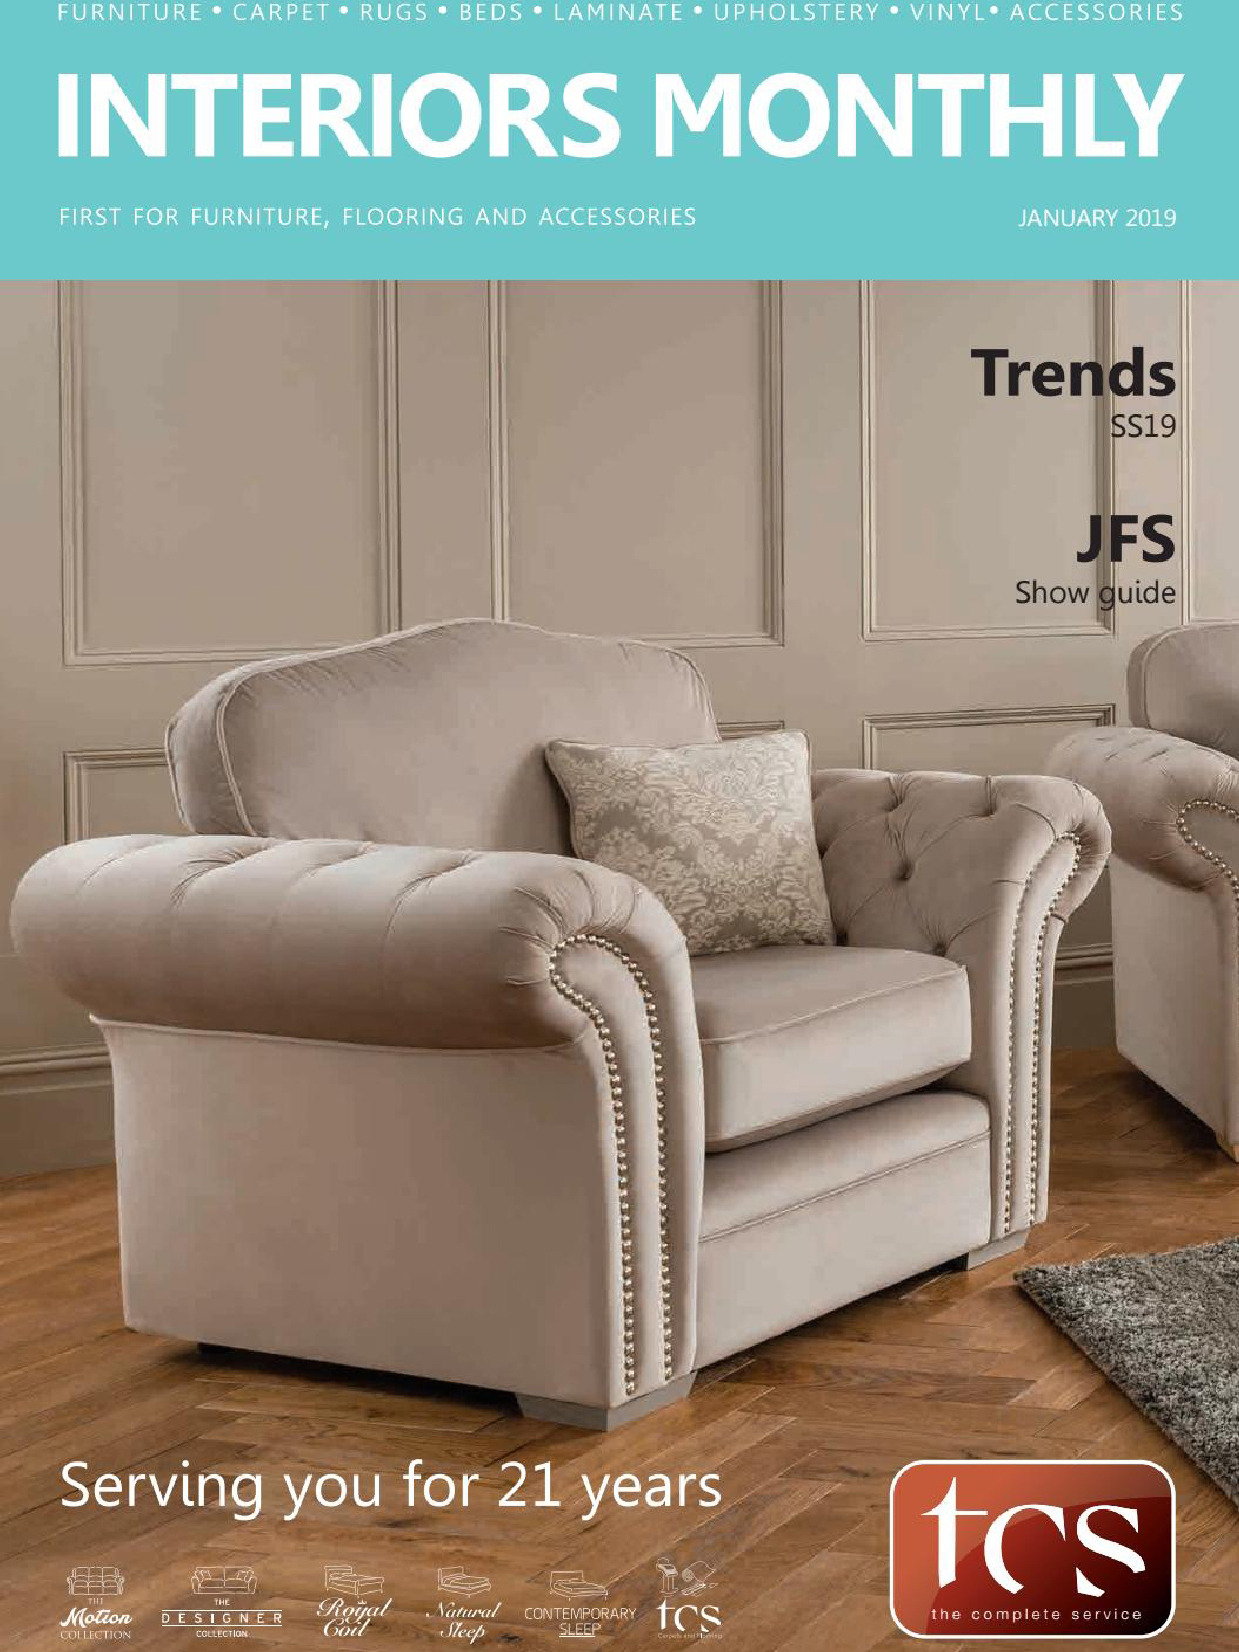 《Interiors Monthly》英国室内设计杂志2019年01月号